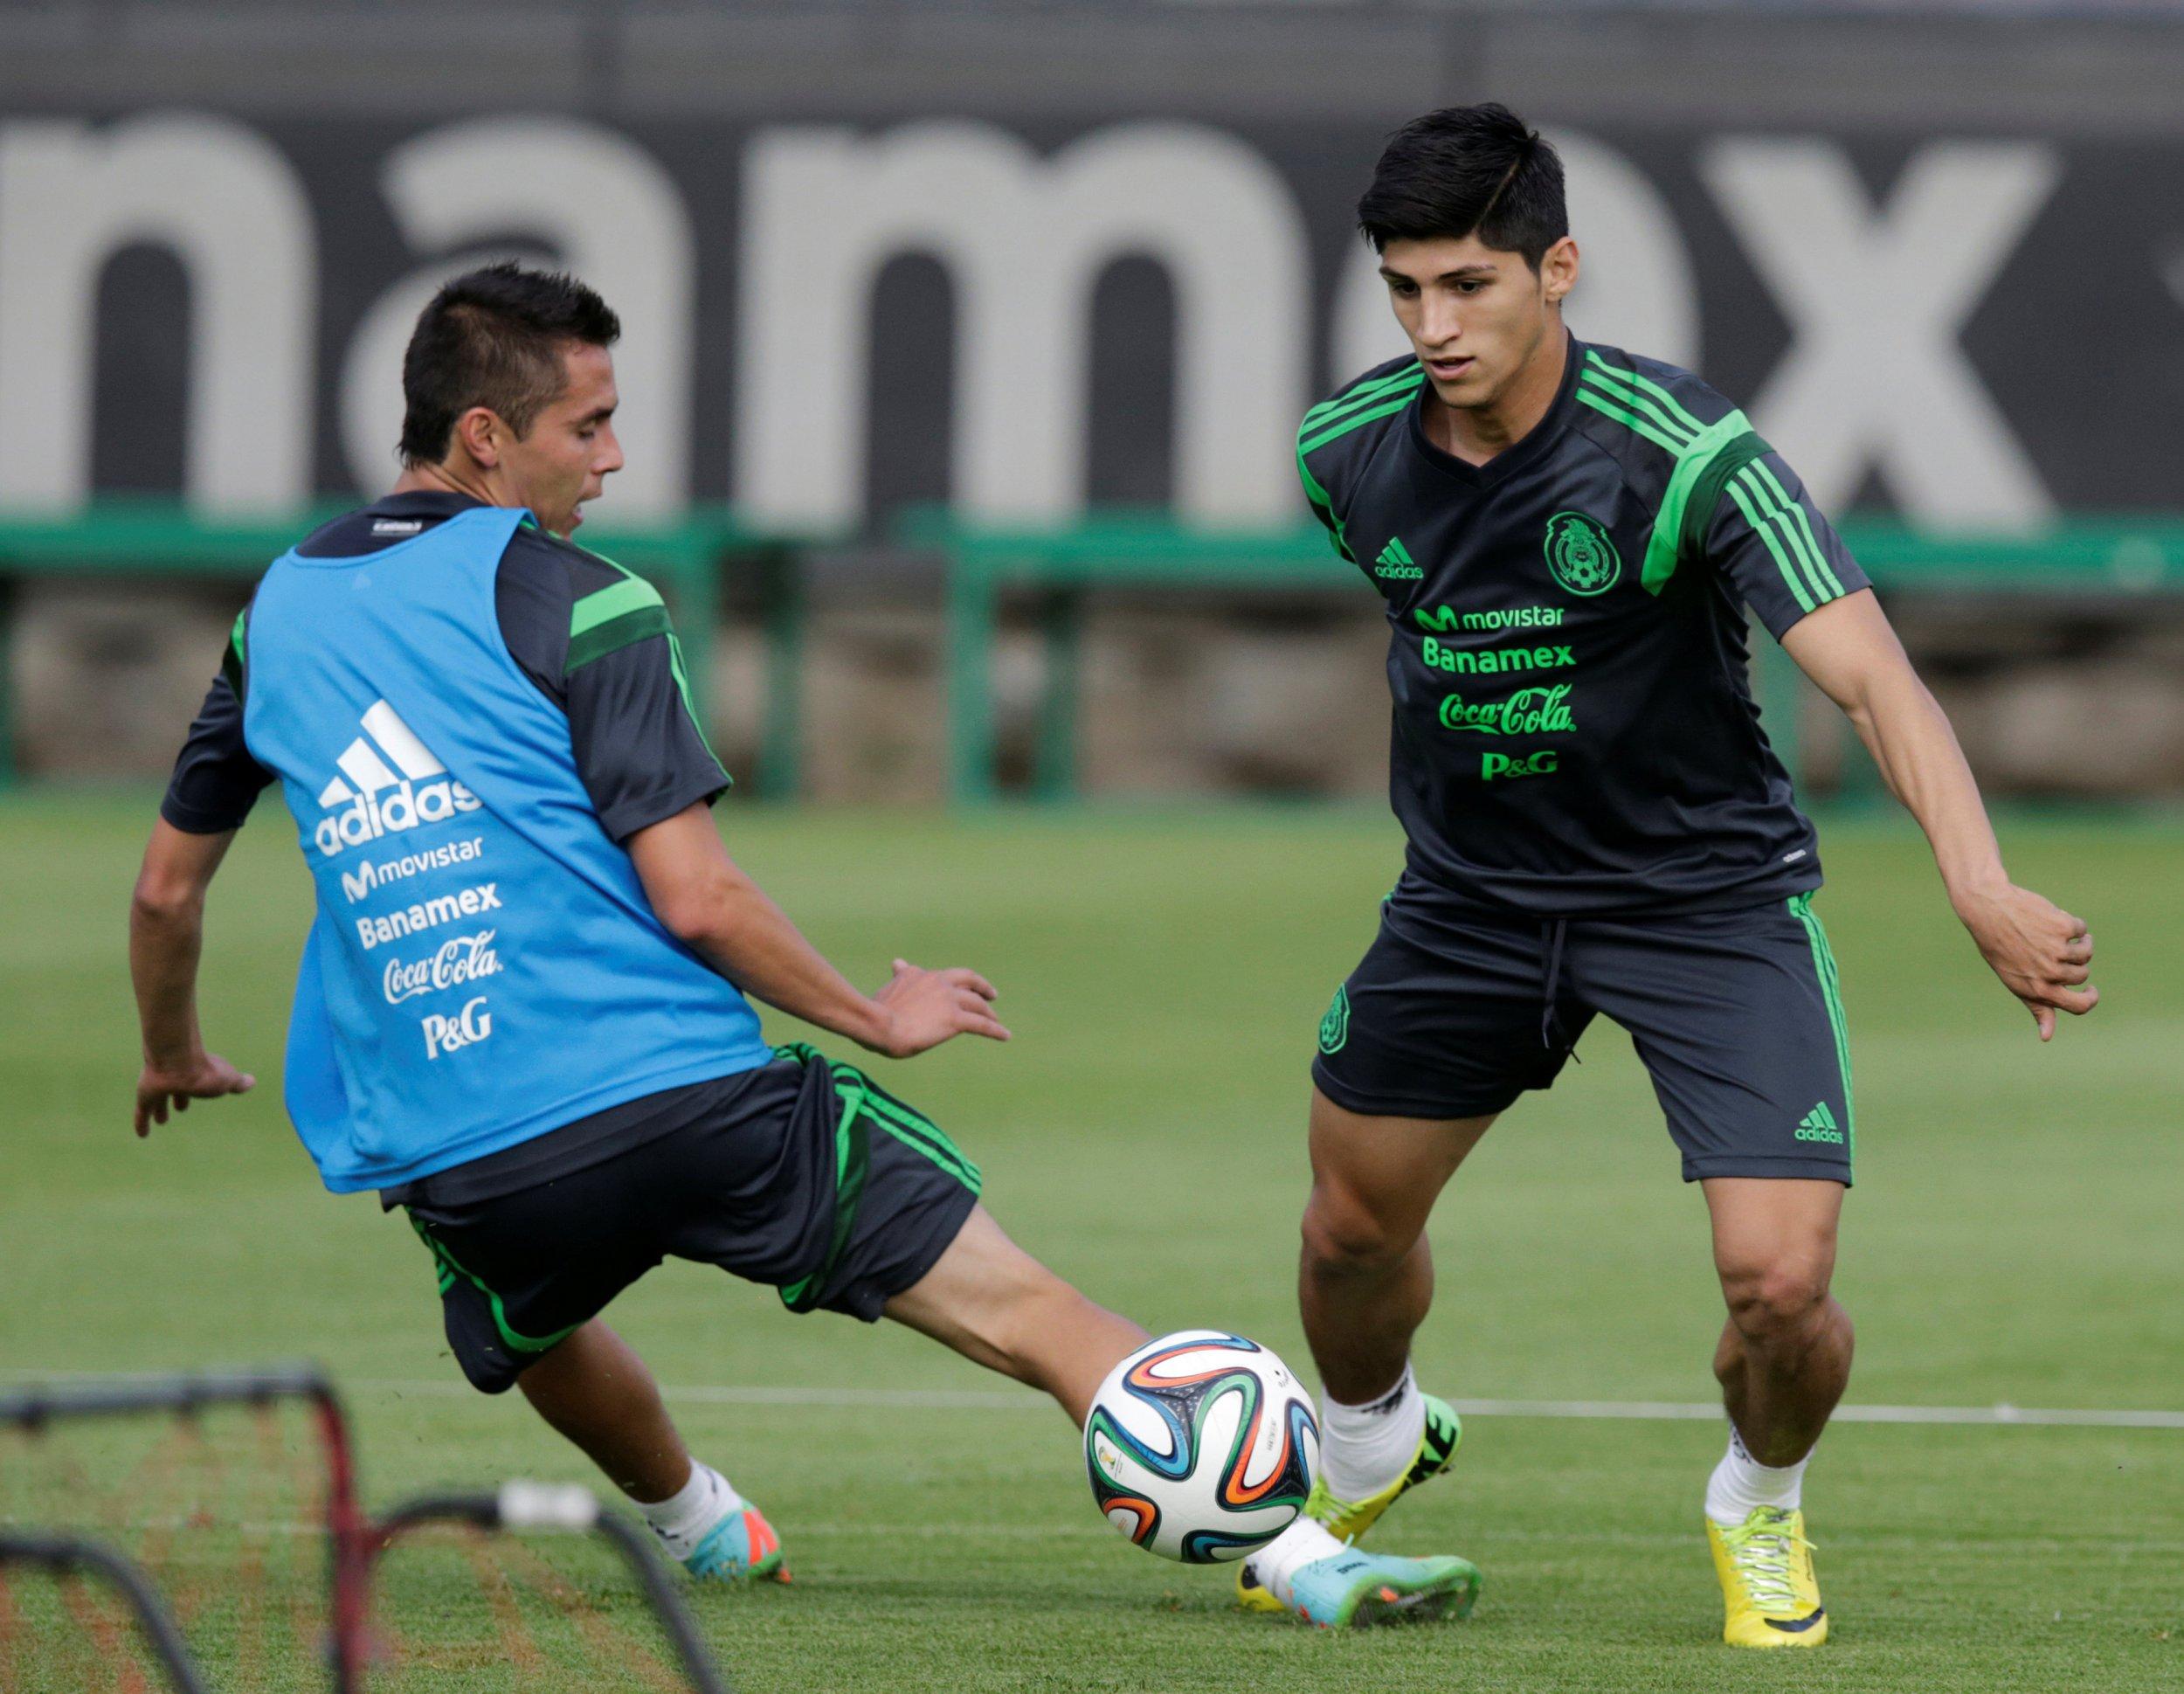 Mexico striker Alan Pulido dribbles past teammate.